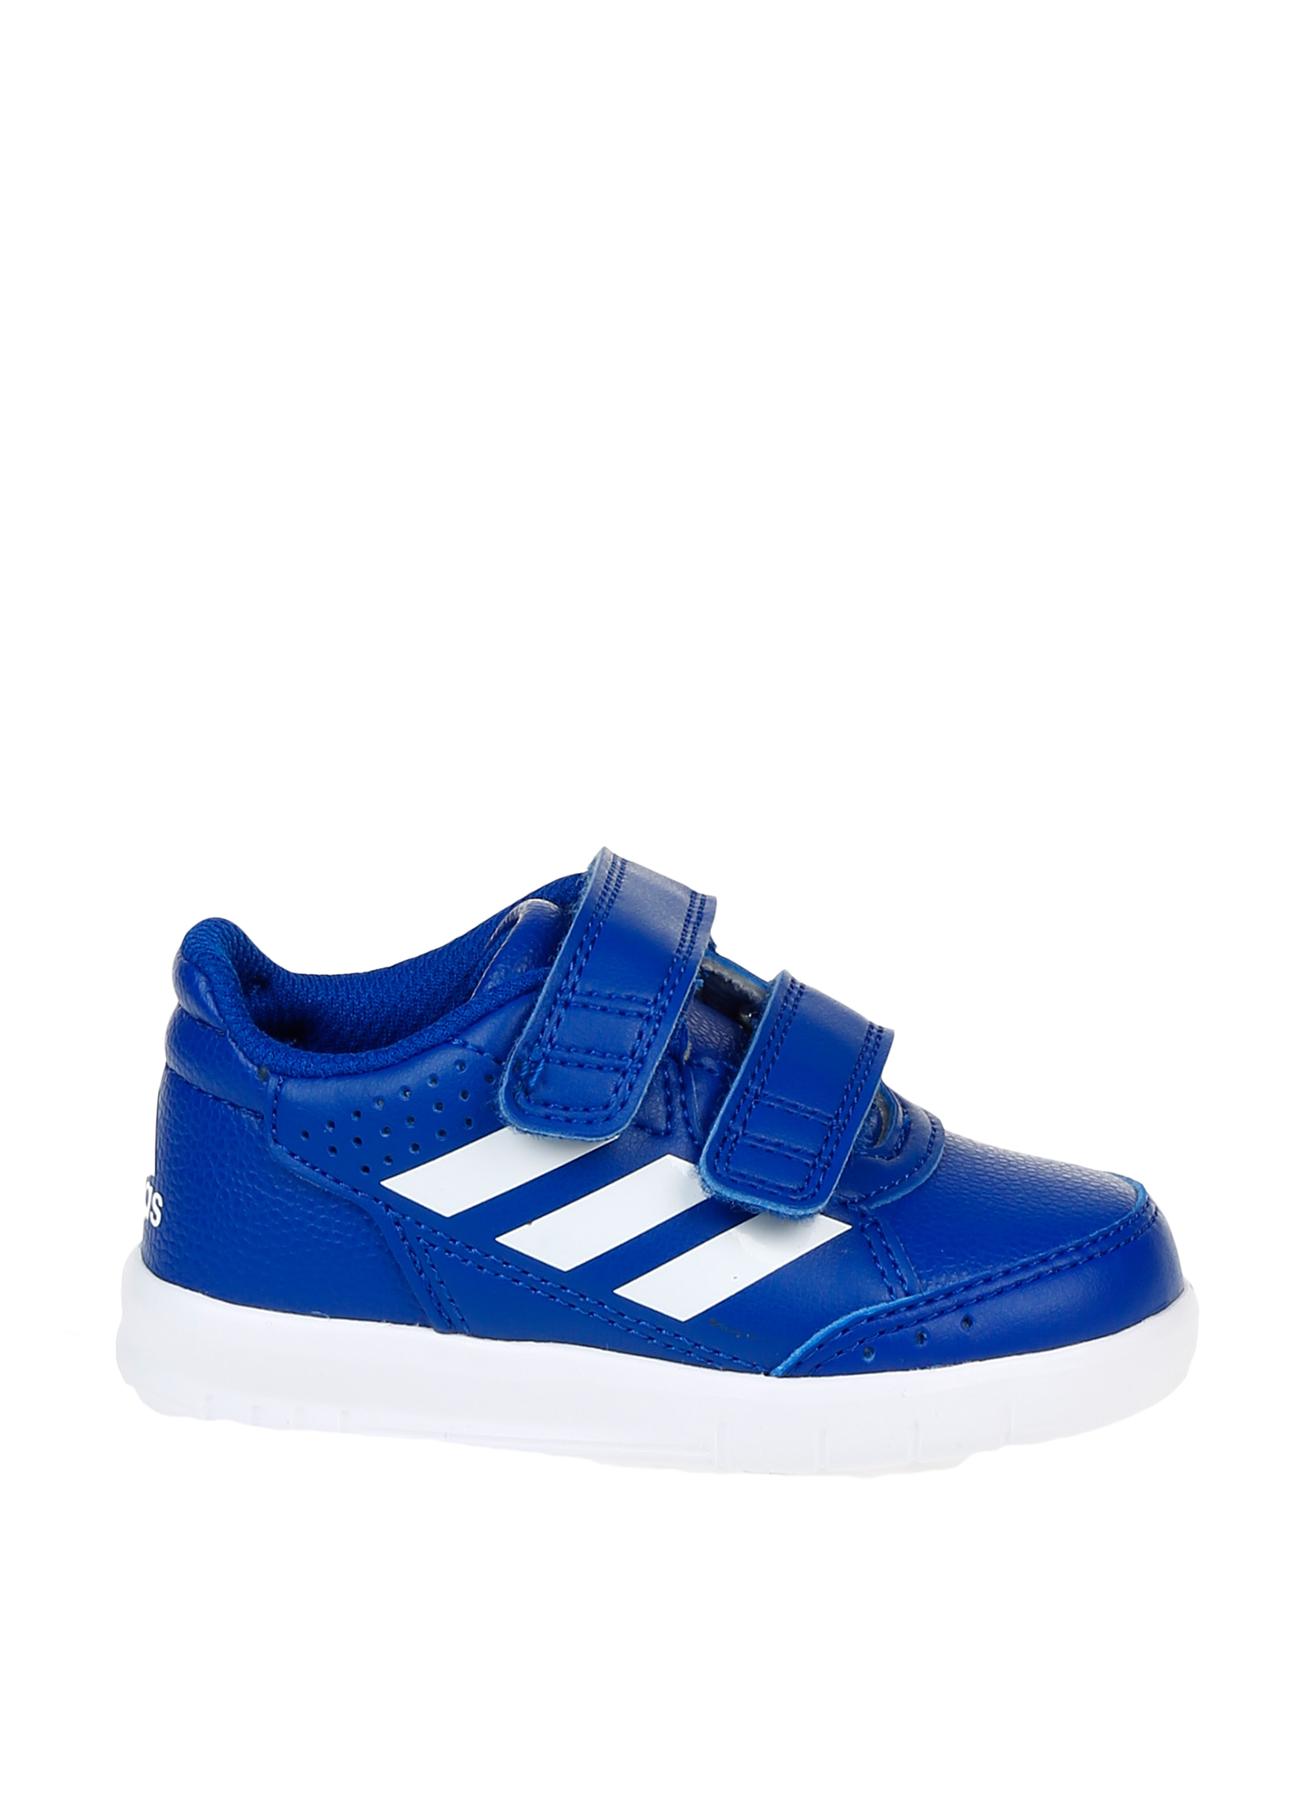 adidas Altasport Cf I Antrenman Ayakkabısı 25 5001696755007